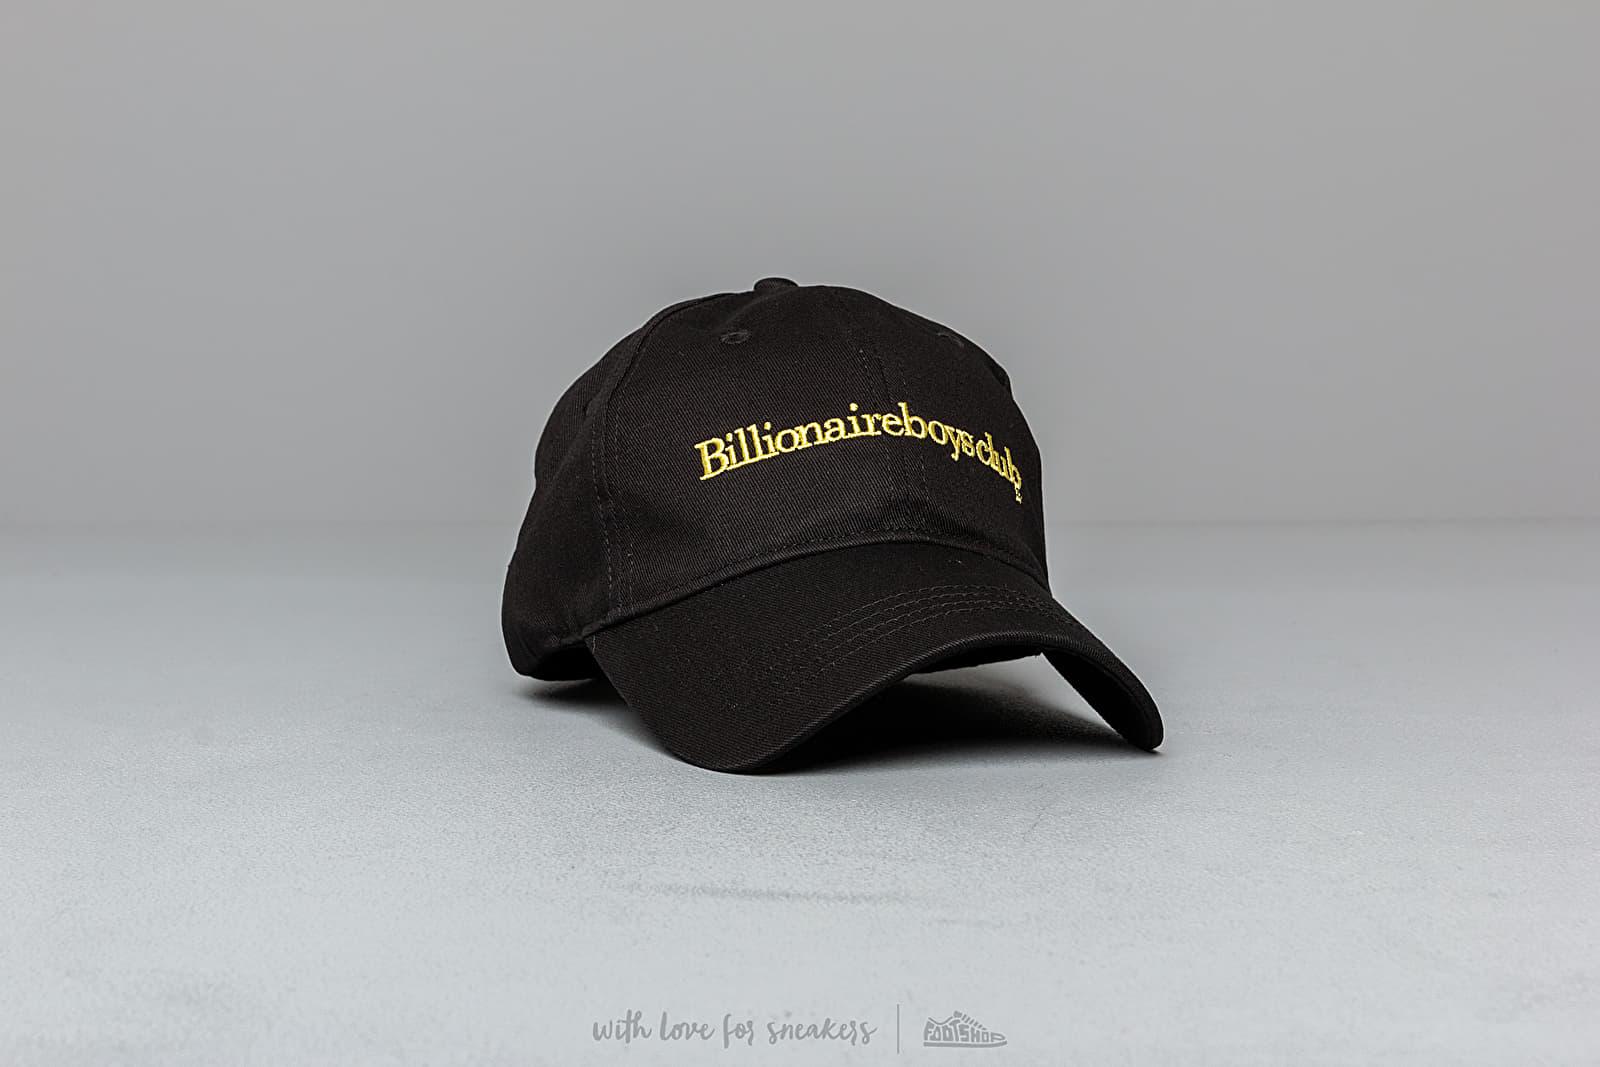 Billionaire Boys Club Embroidered Curved Visor Cap